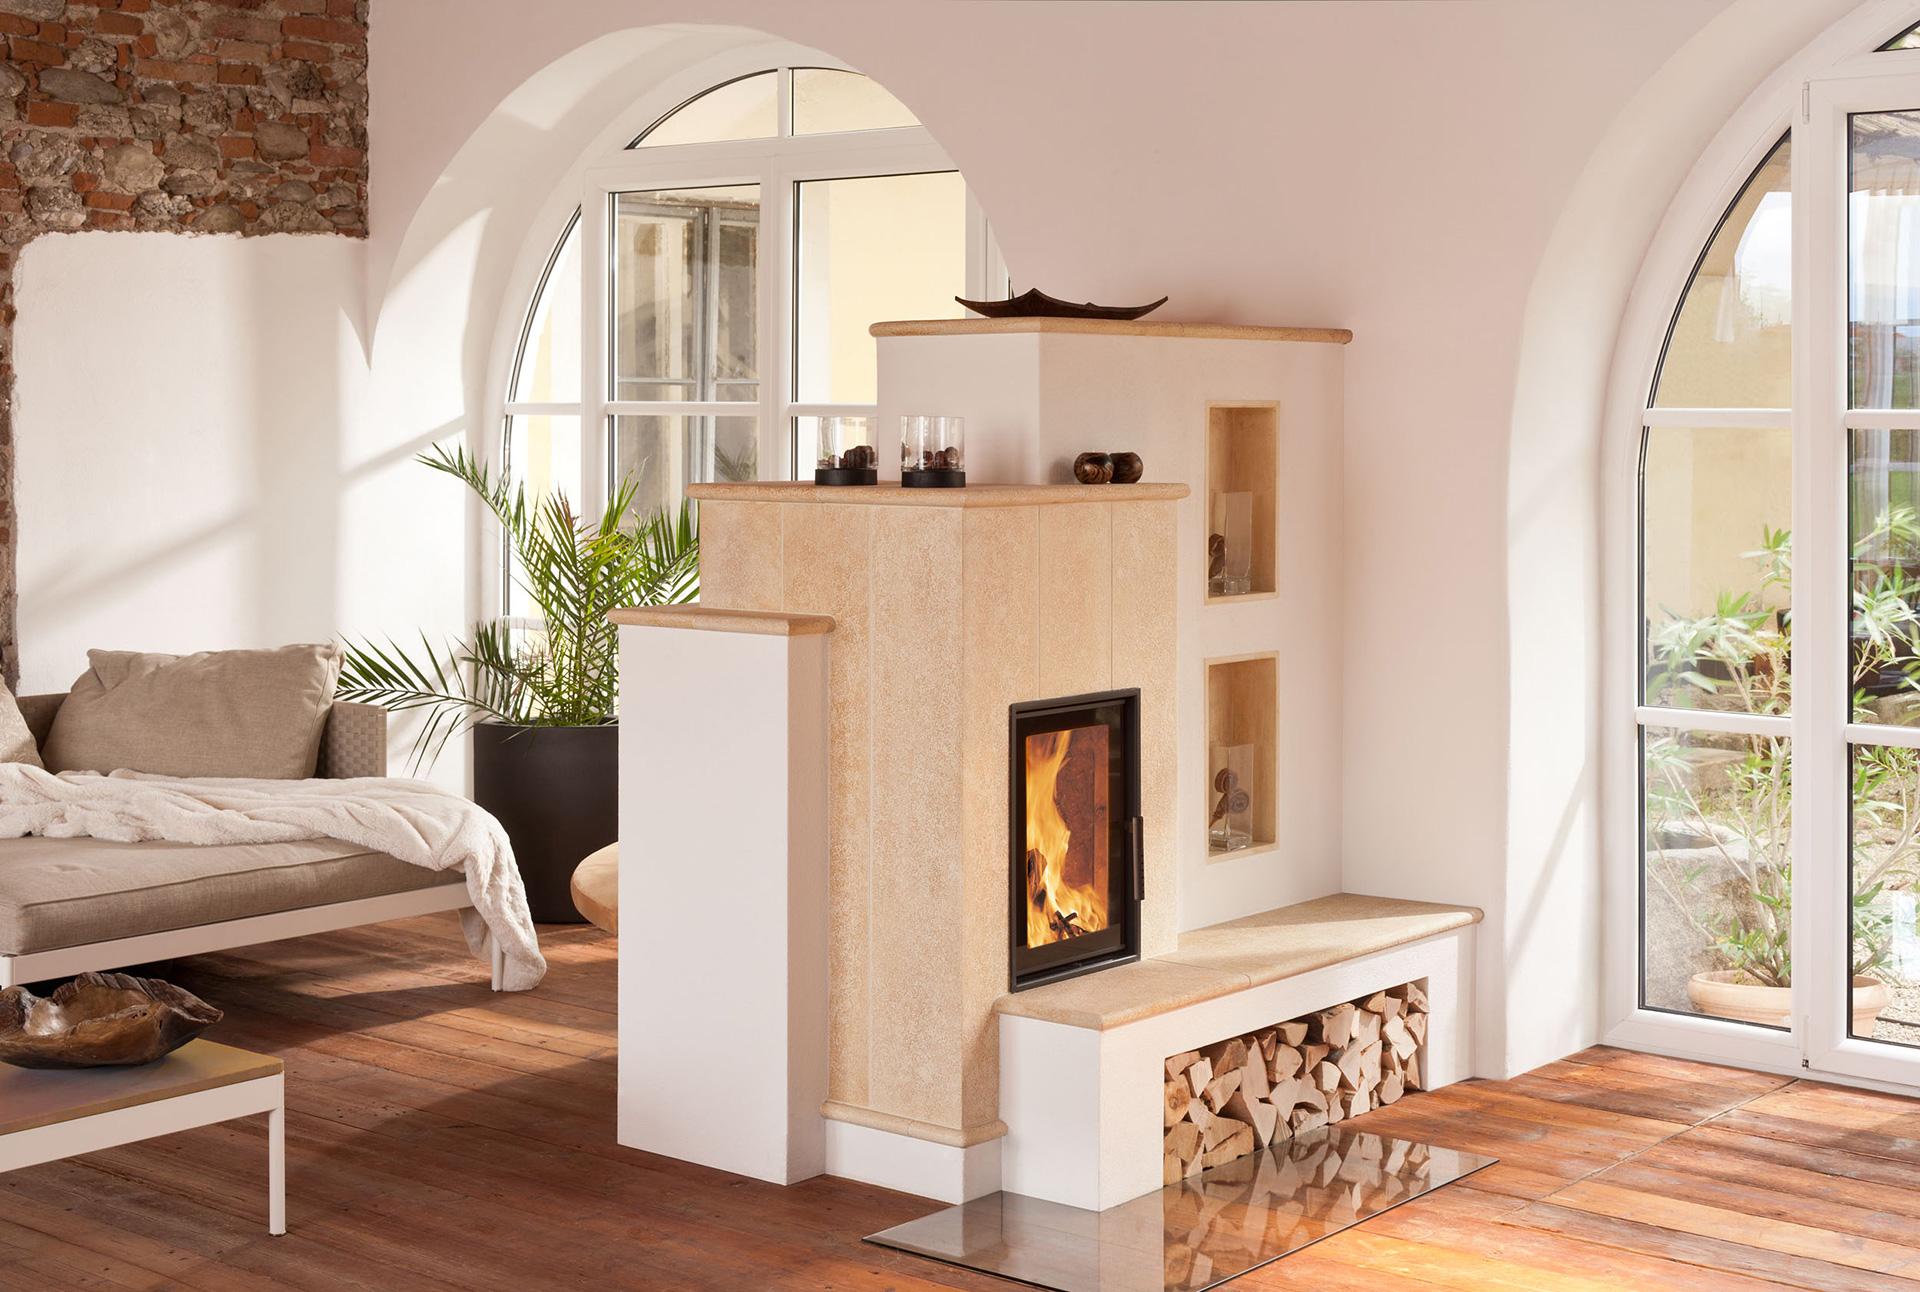 Warmwasseraufbereitung/Kesseltechnik 2086